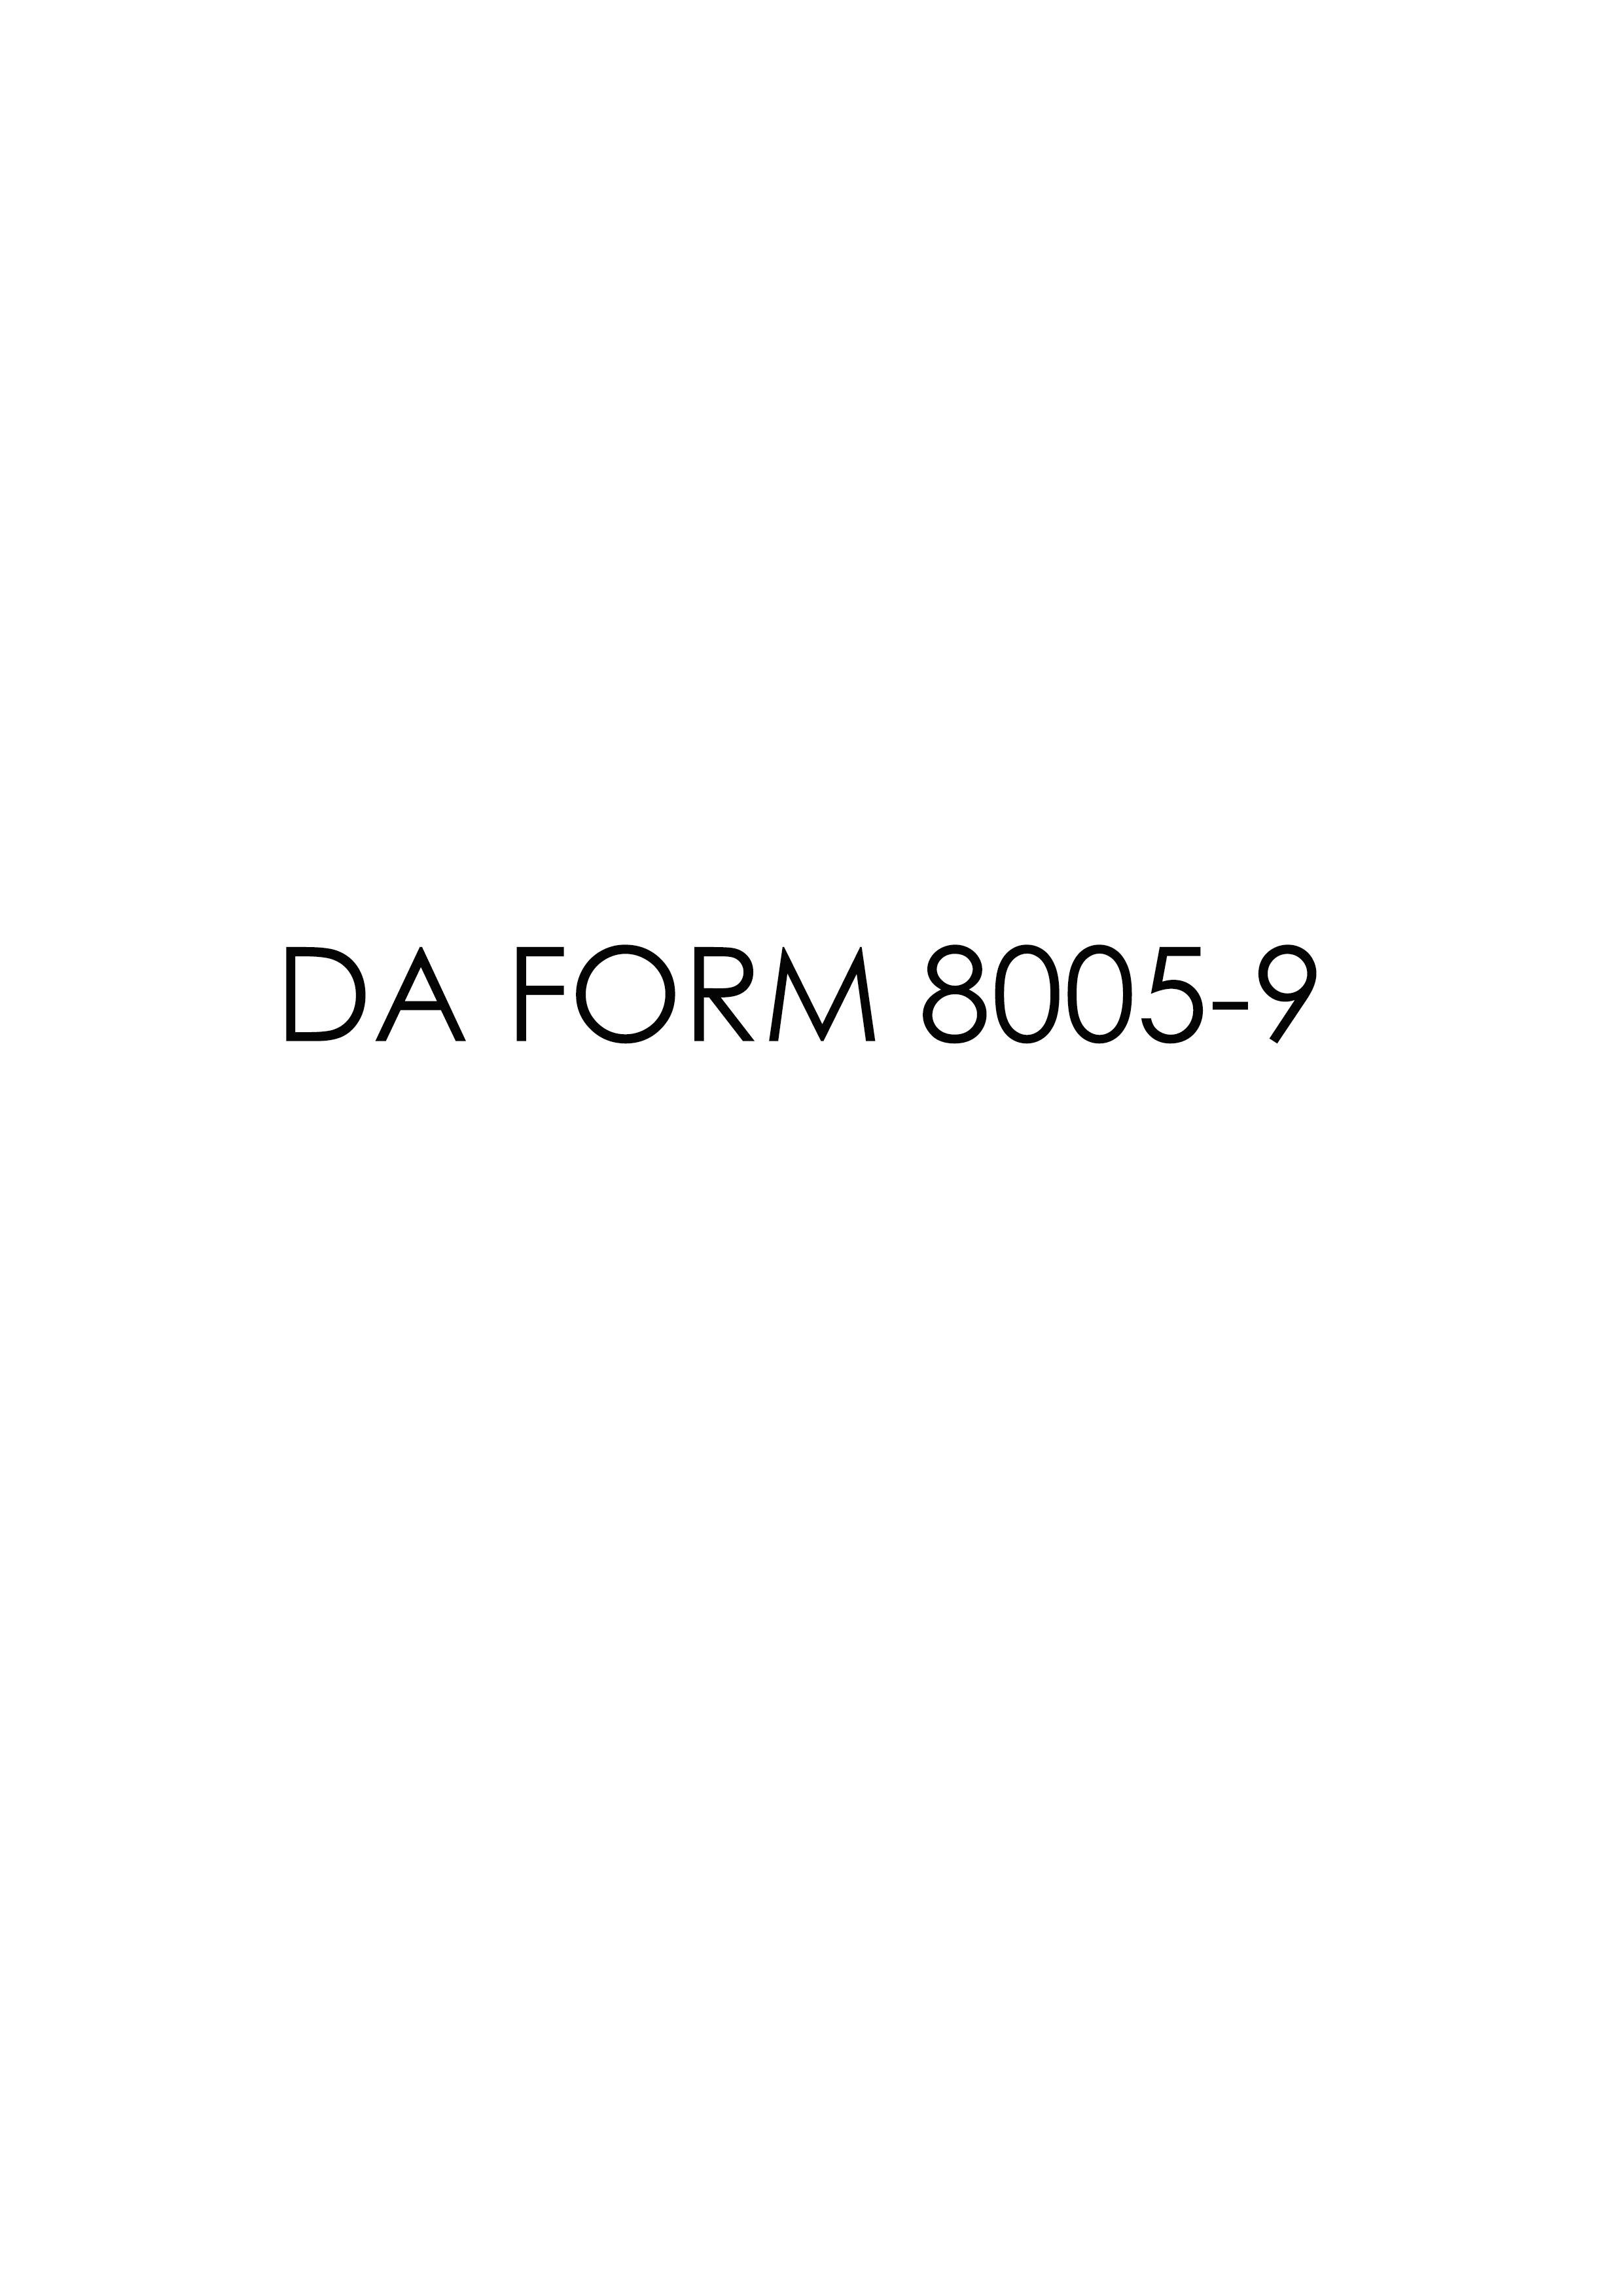 Download da Form 8005-9 Free